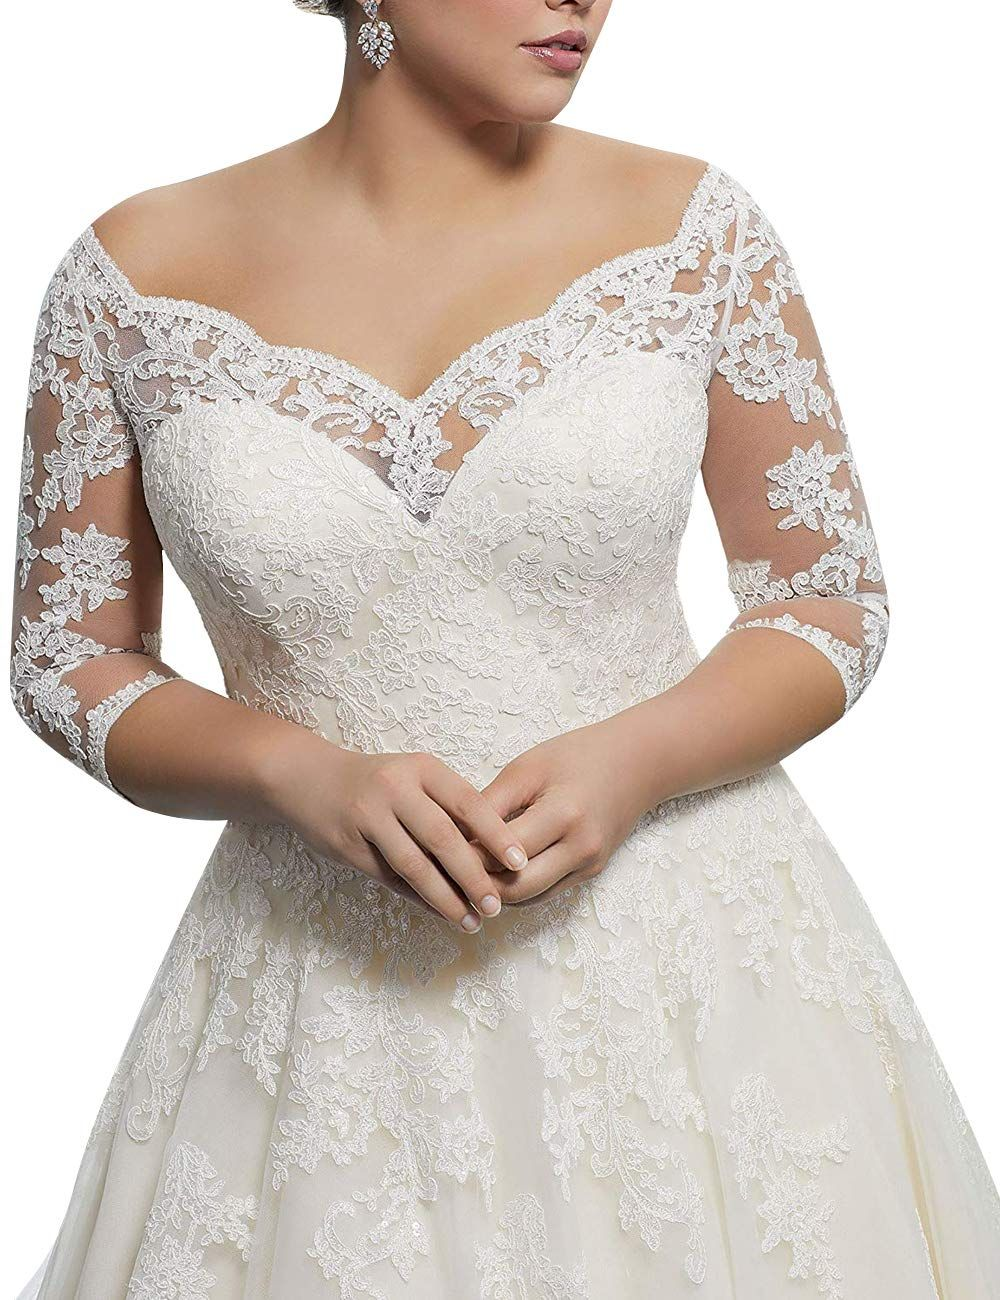 Https Images Na Ssl Images Amazon Com Images I 719azuznfxl Jpg Short Wedding Dress Bridal Ball Gown Plus Wedding Dresses [ 1300 x 1000 Pixel ]